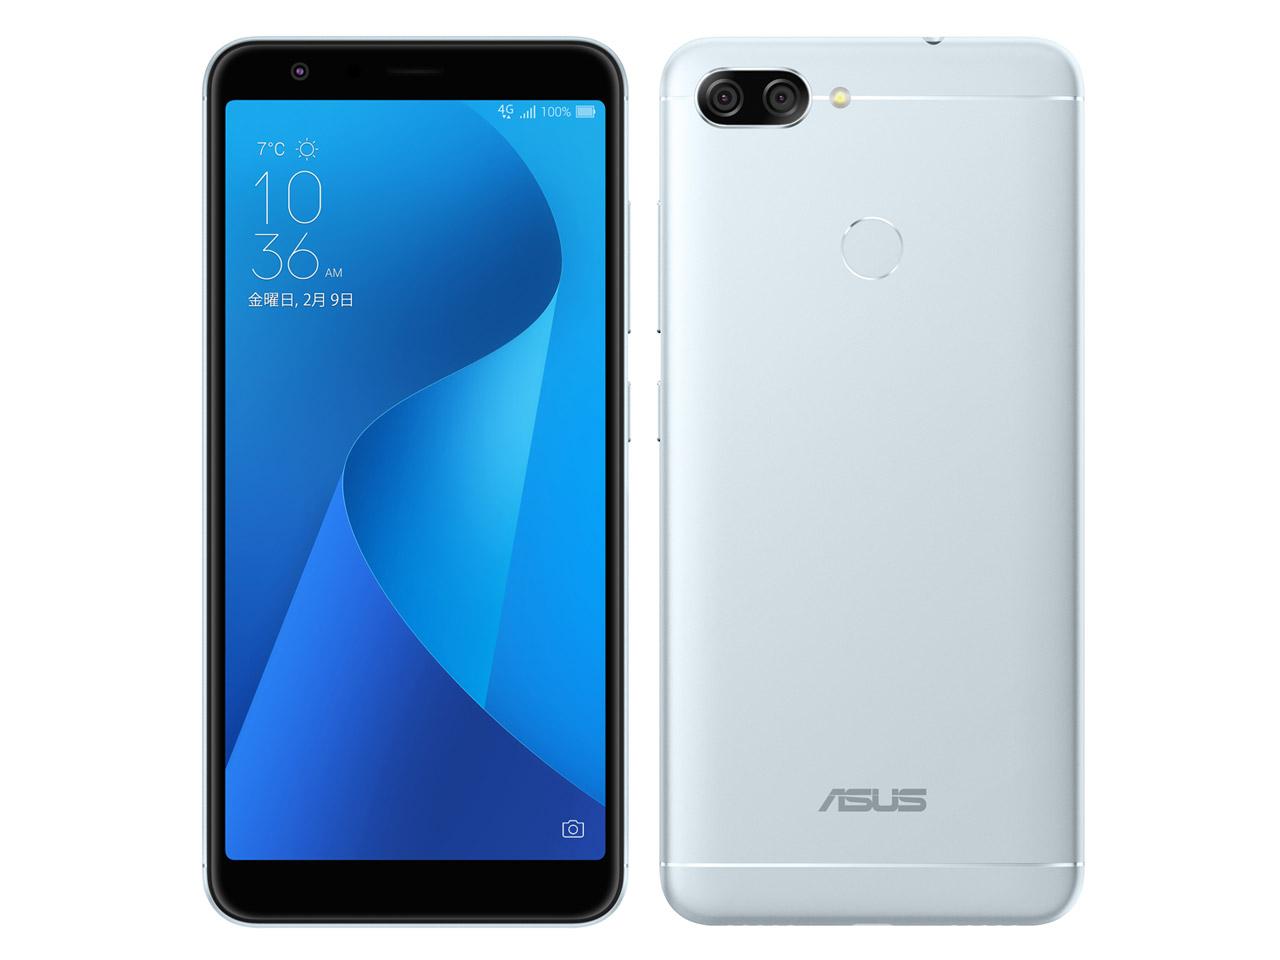 ZenFone Max Plus [アズールシルバー] SIMフリー  ASUS(エイスース・アスース)